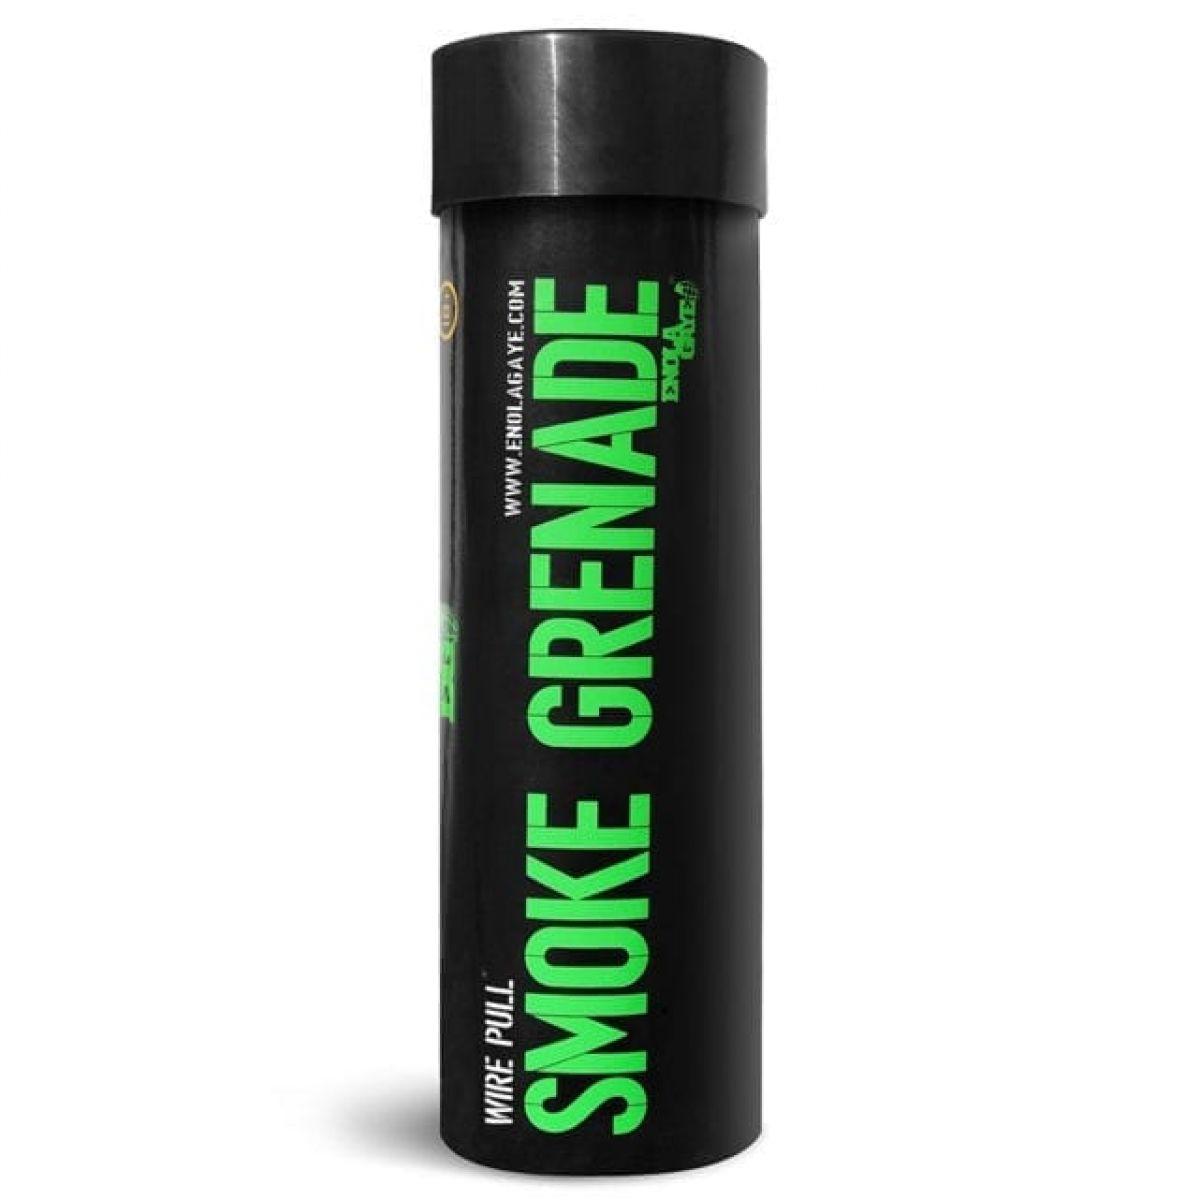 WP40-GREEN enola smoke grenade